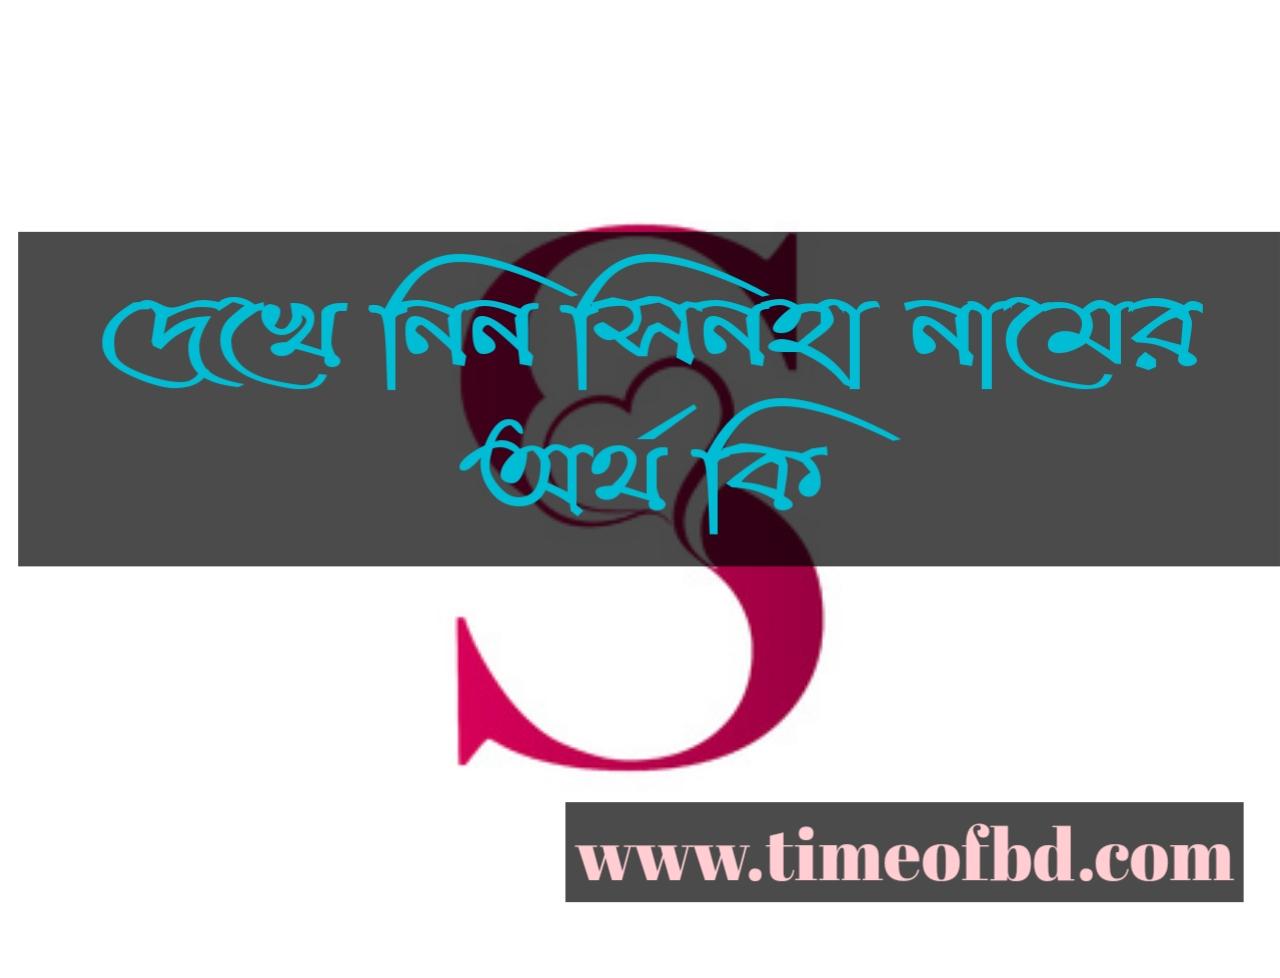 Sinha name meaning in Bengali, সিনহা নামের অর্থ কি, সিনহা নামের বাংলা অর্থ কি, সিনহা নামের ইসলামিক অর্থ কি,